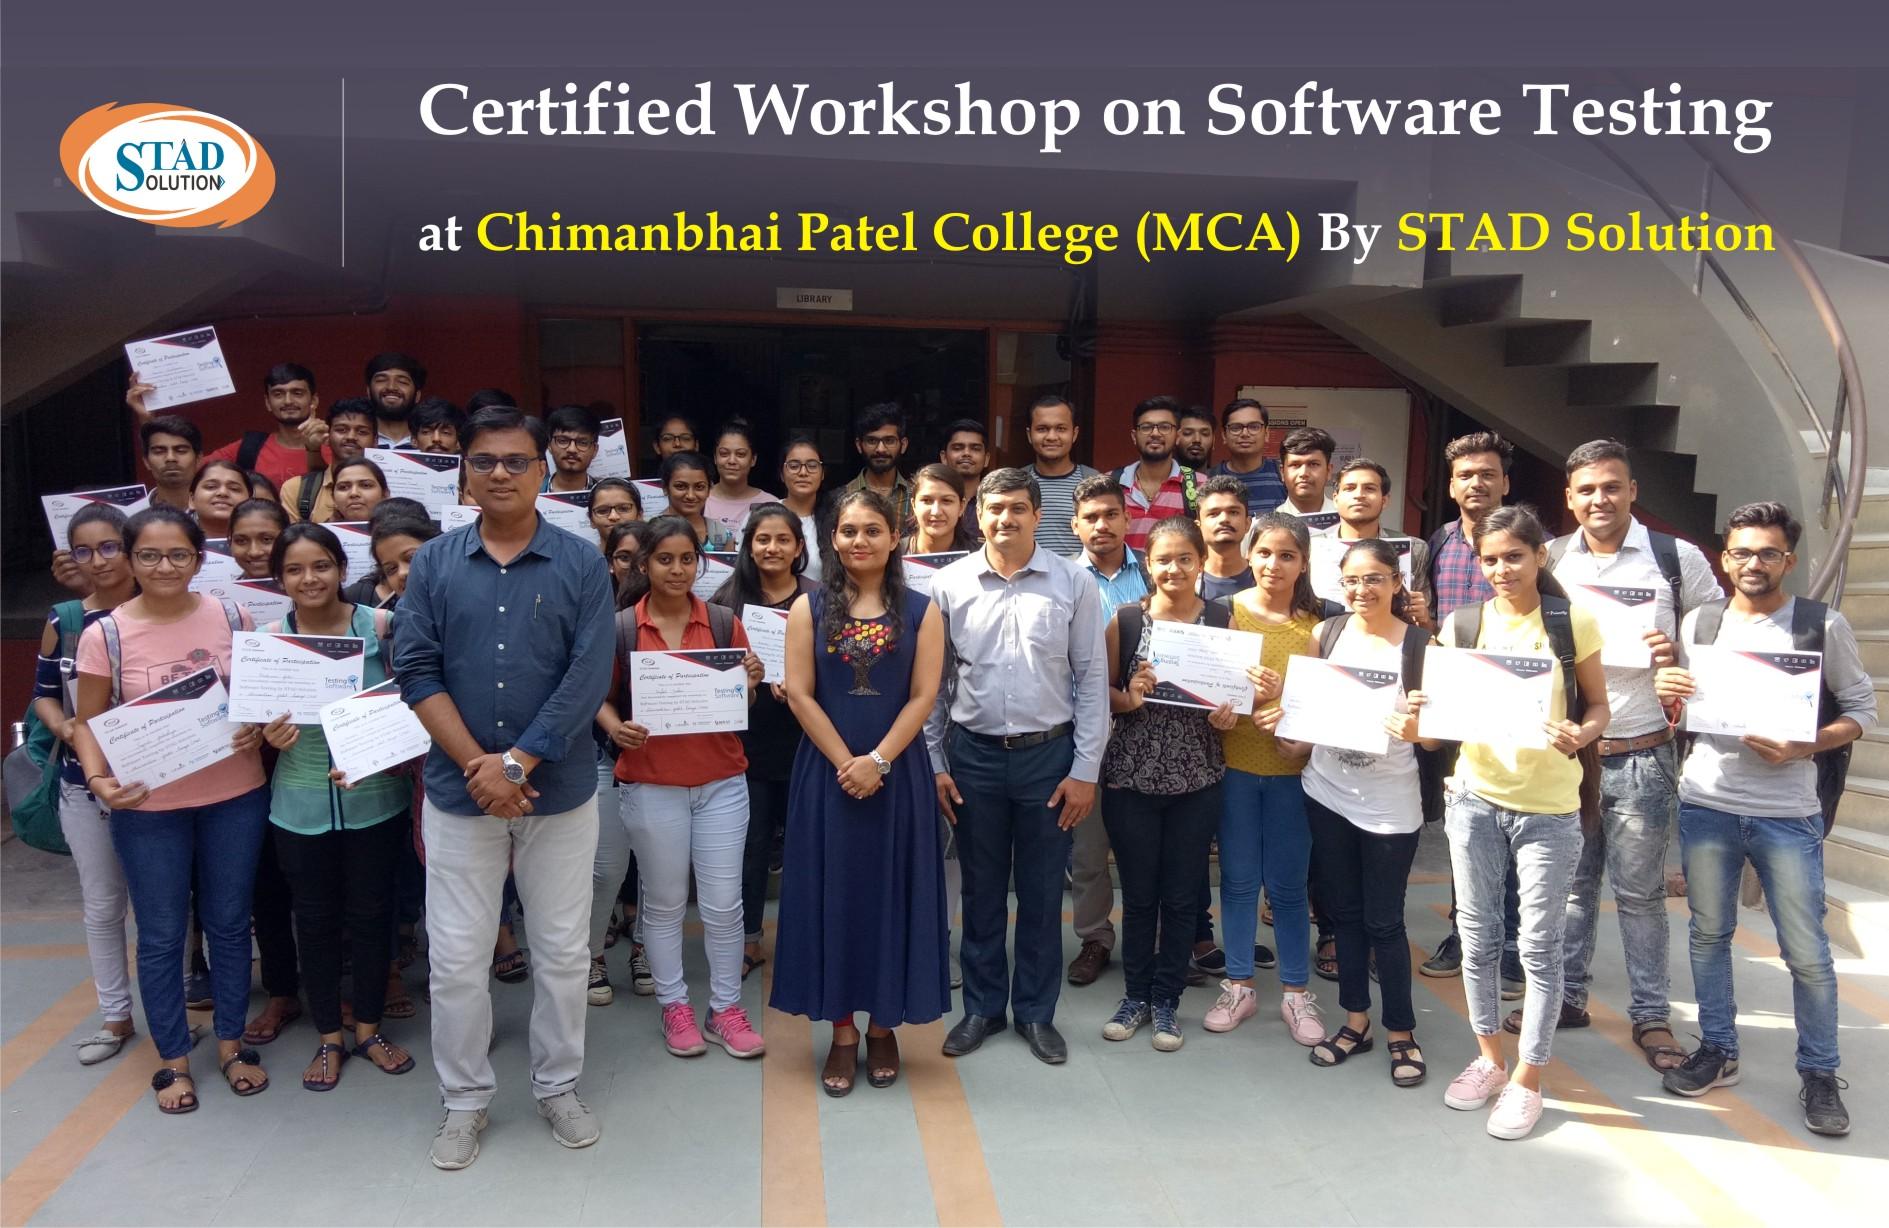 Chimanbhai Patel College